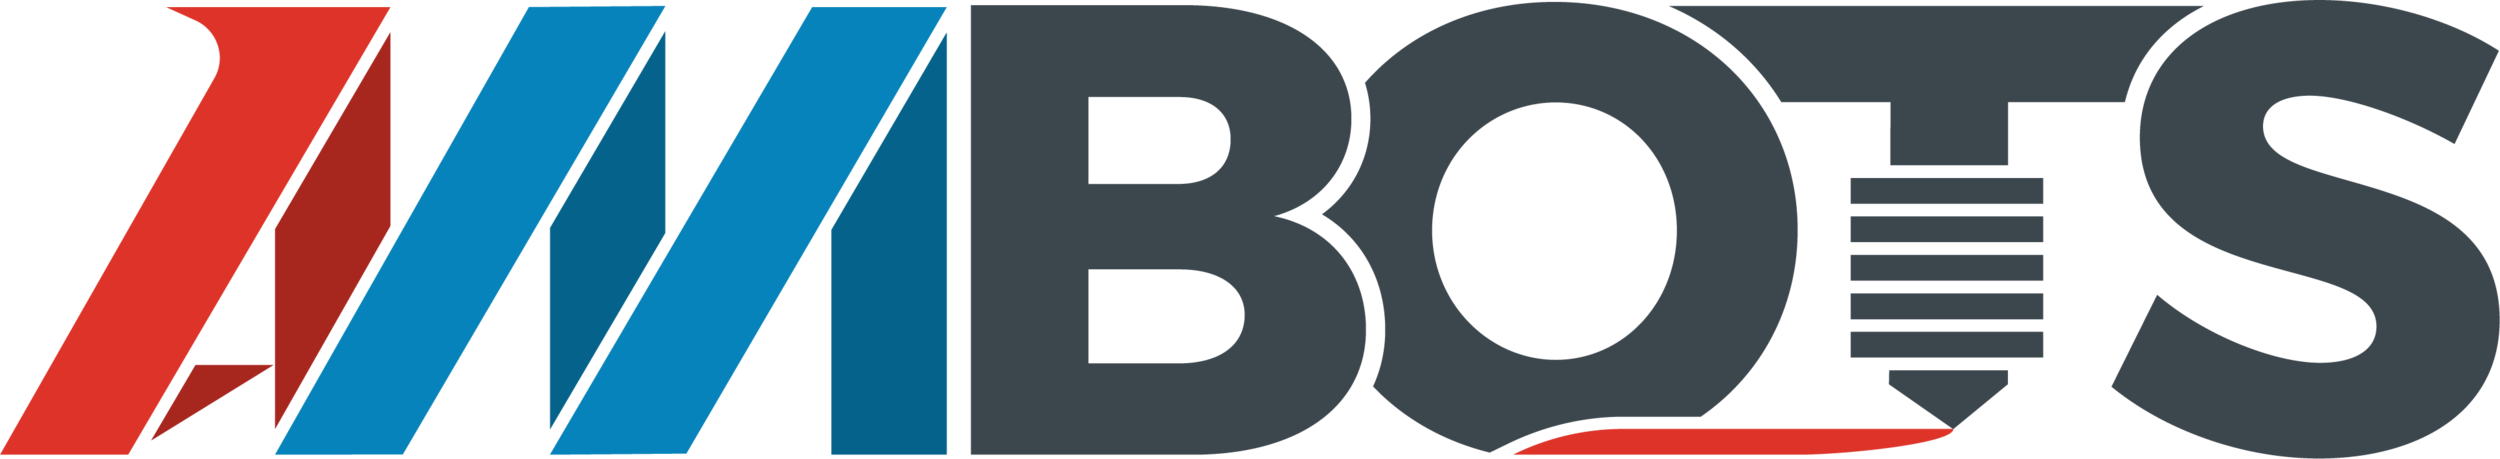 ambots-logo.png